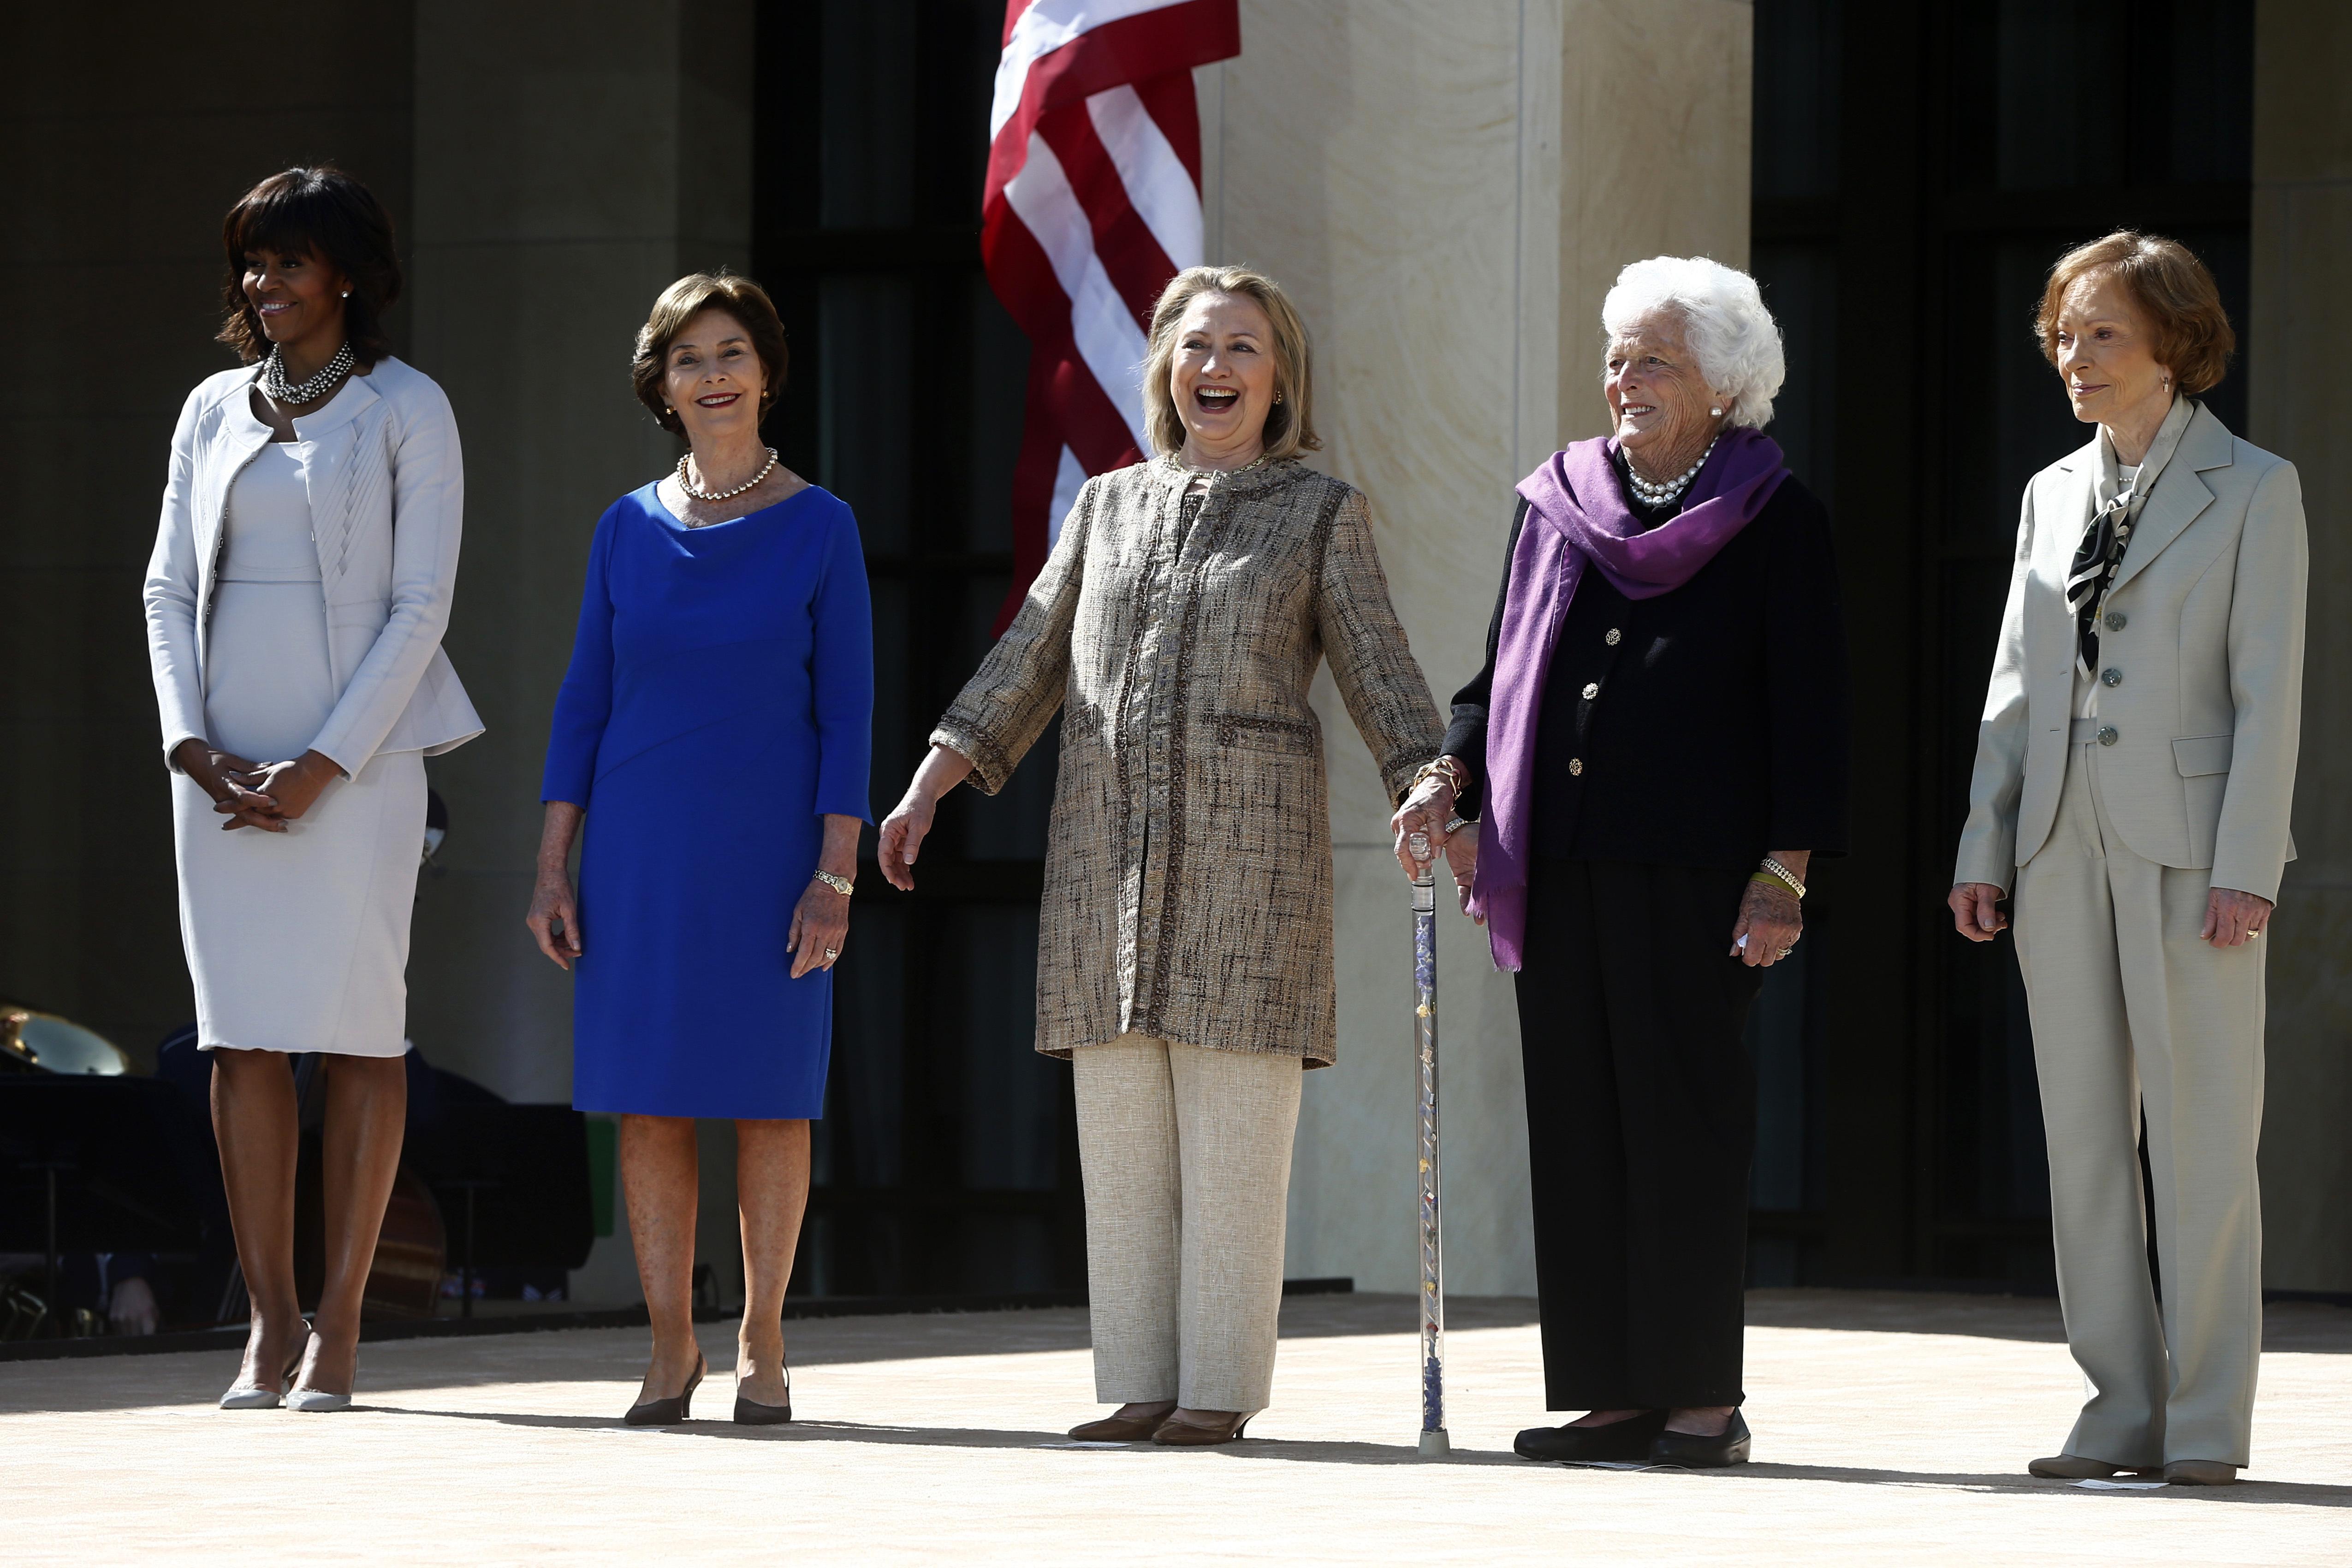 ormer first ladies: Laura Bush; Hillary Rodham Clinton; Barbara Bush; and Rosalynn Carter